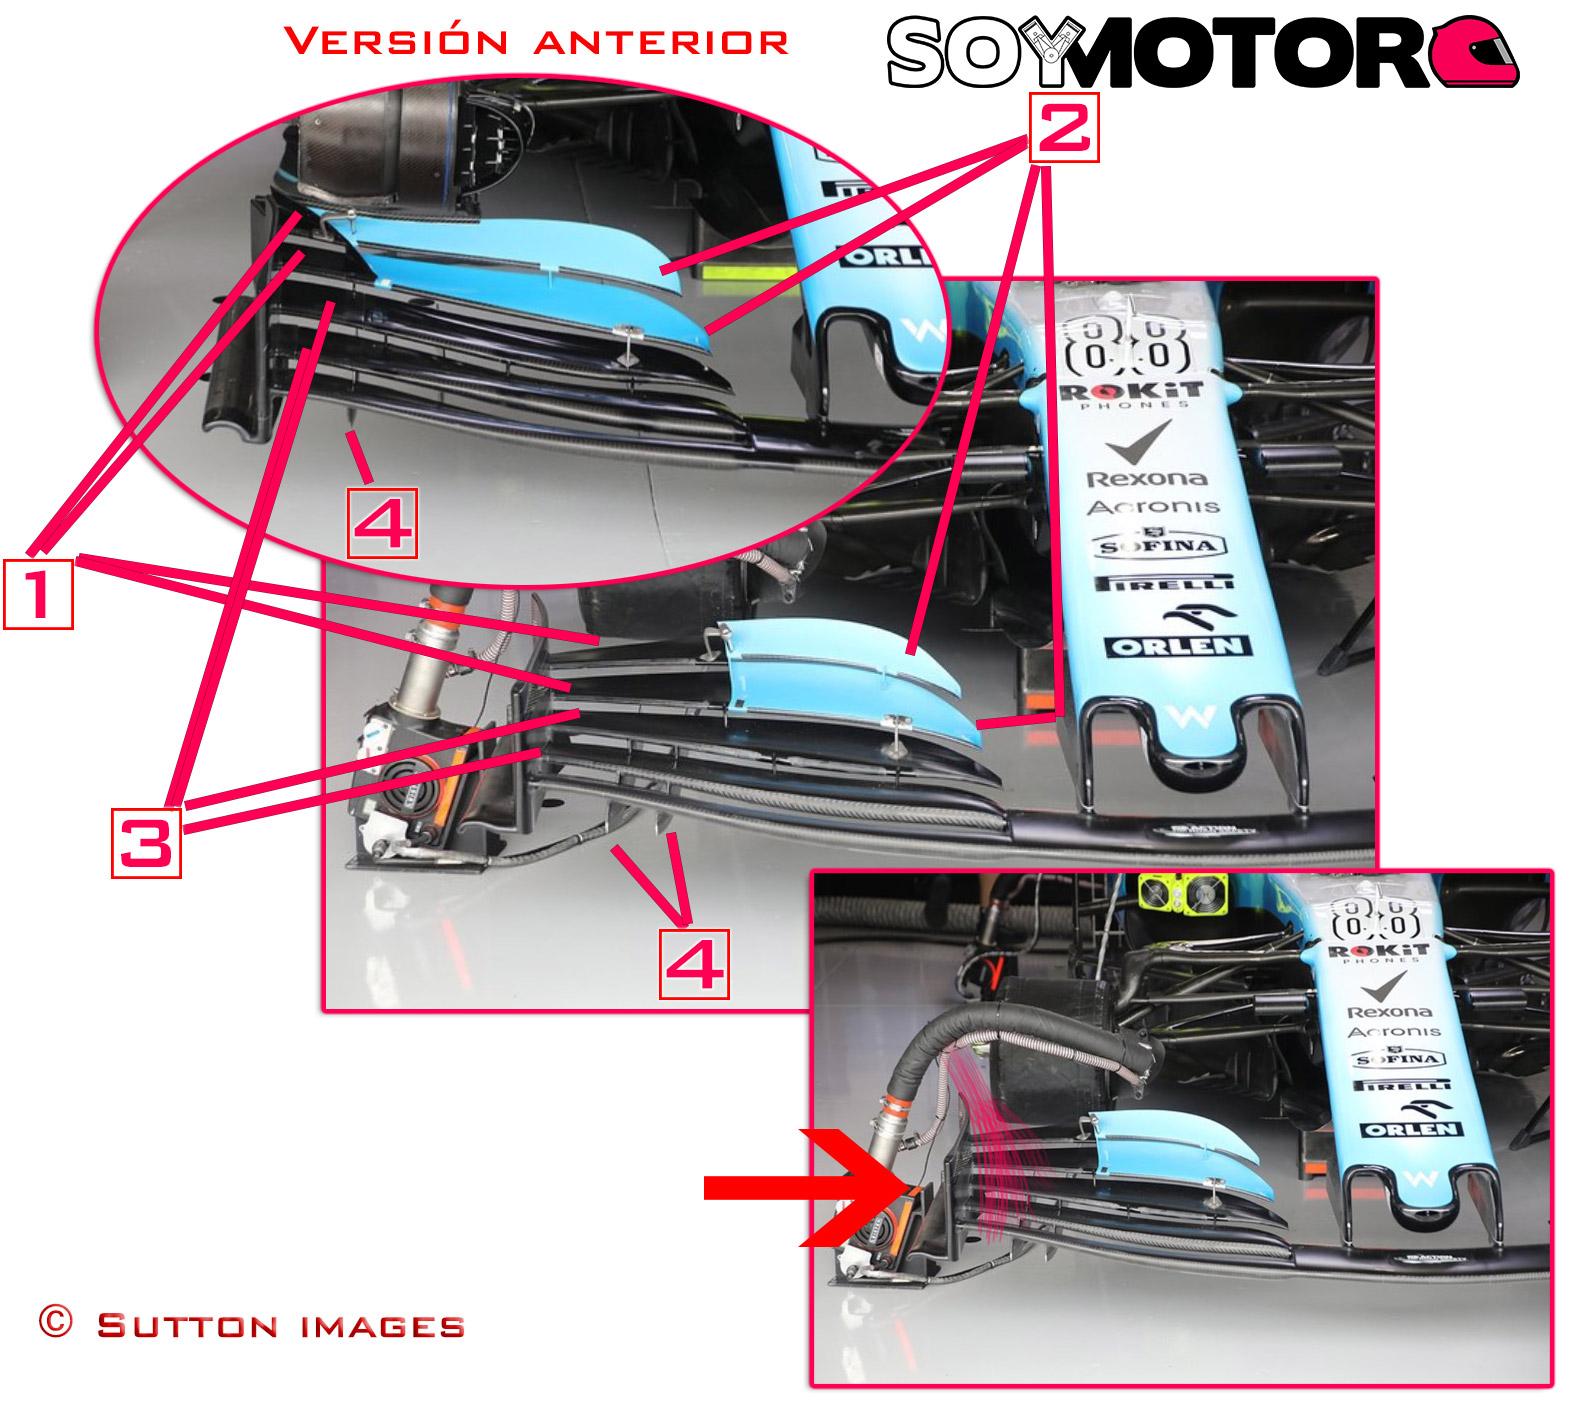 williams-nueva-ala-delantera-soymotor.jpg